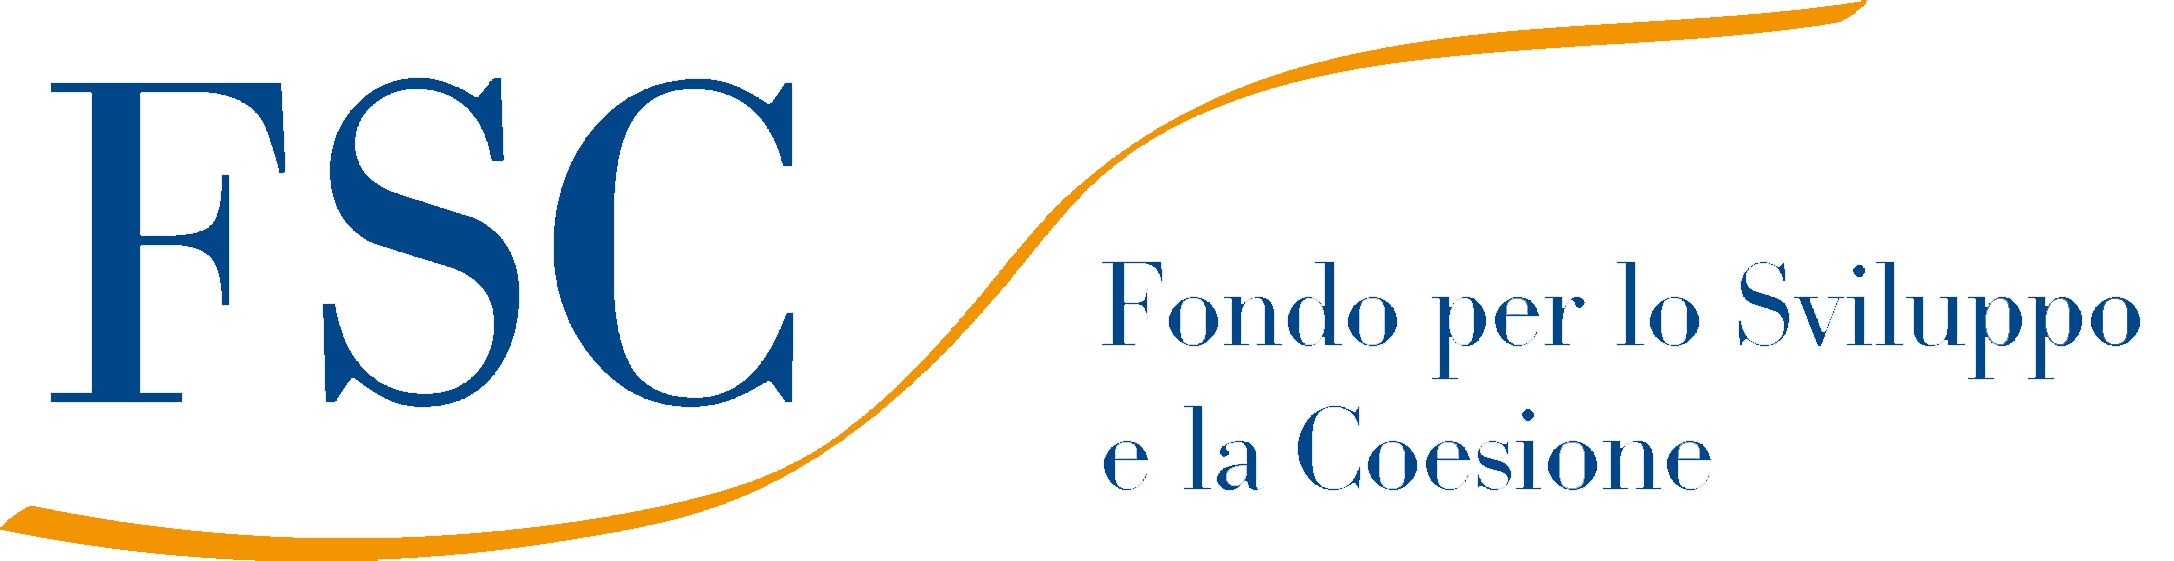 LOGO FONDO FSC